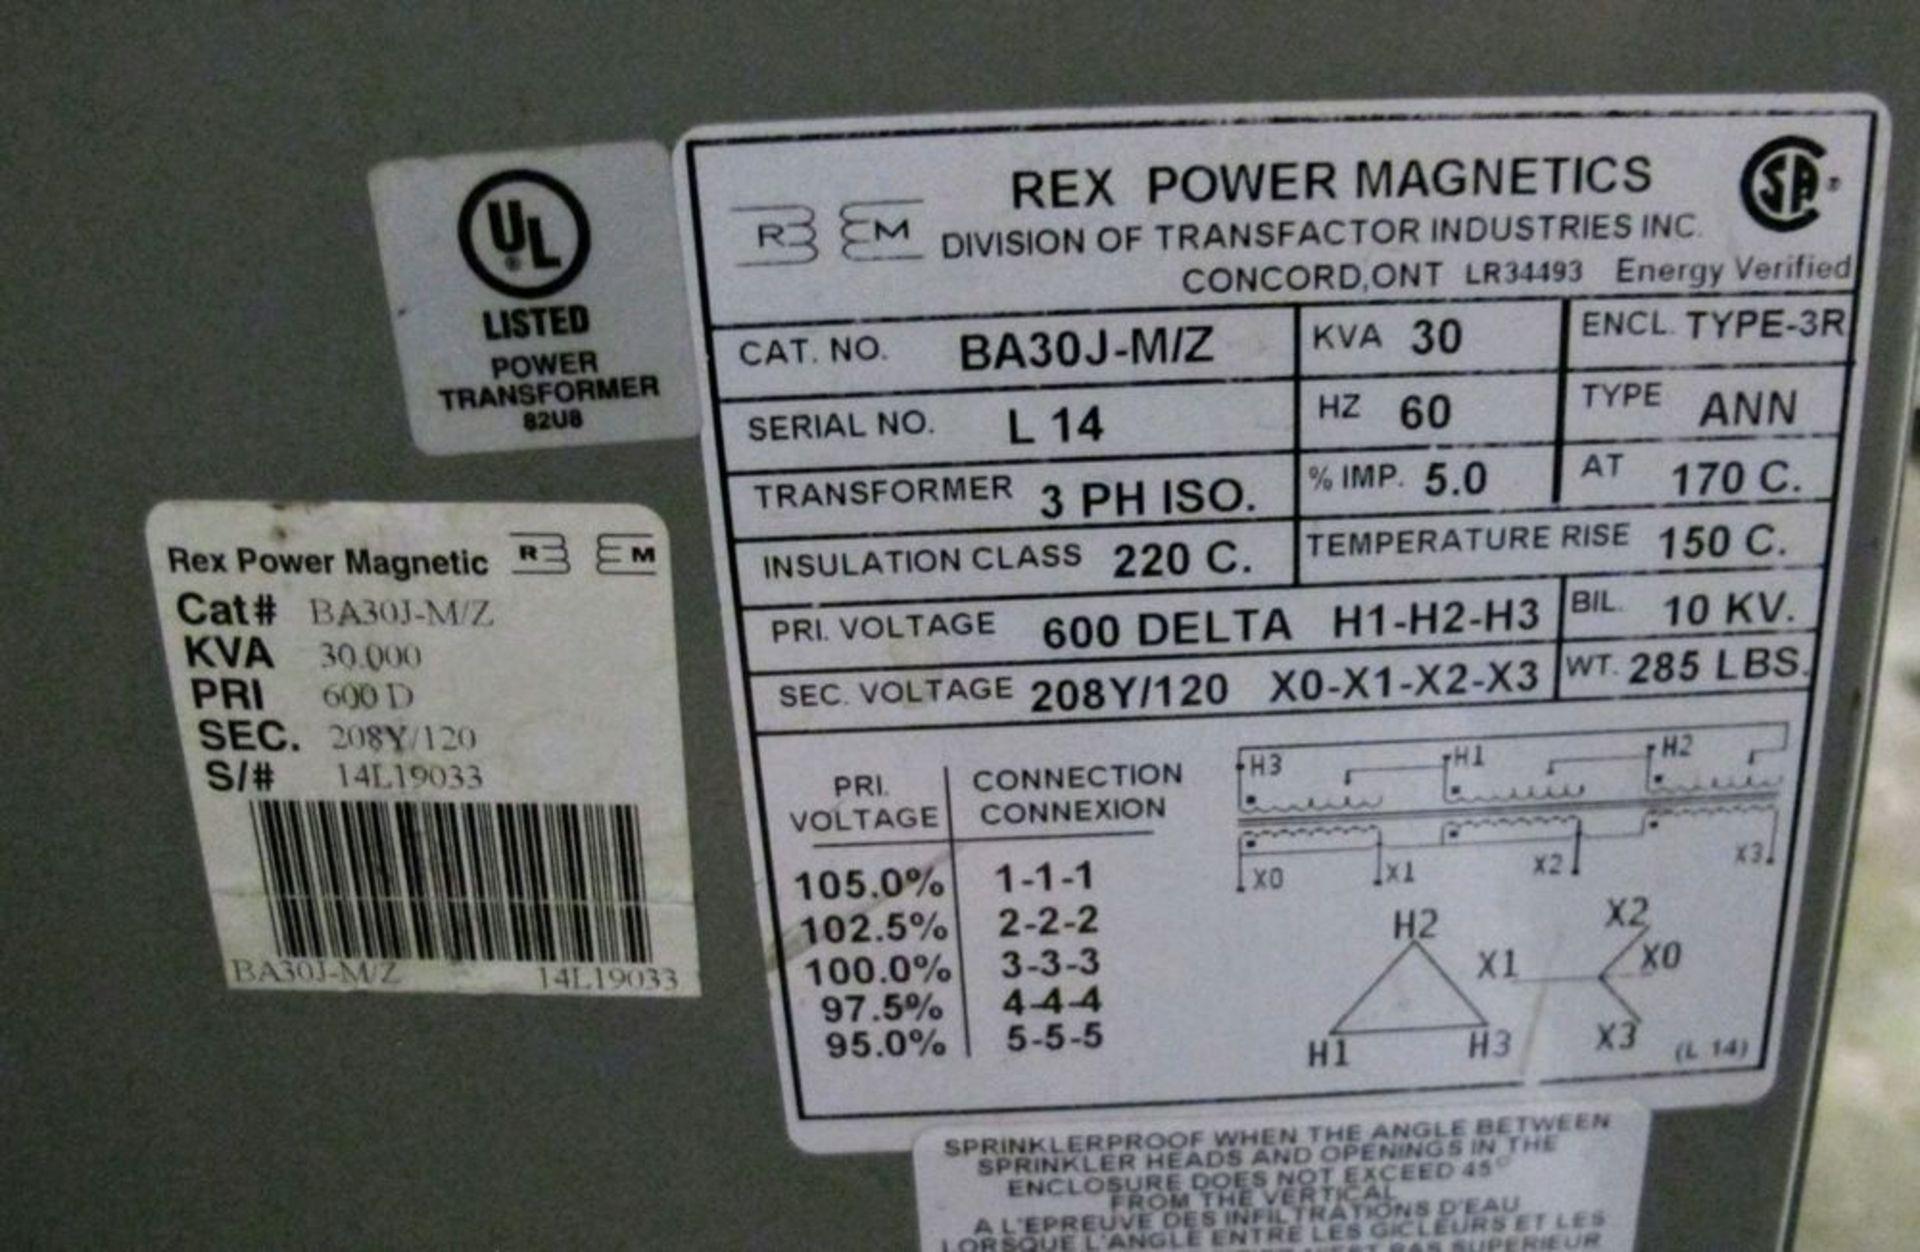 Lot 74 - REX POWER MAGNETICS TRANSFORMER, 30KVA, 600V PRIMARY, 208/120 SECONDARY